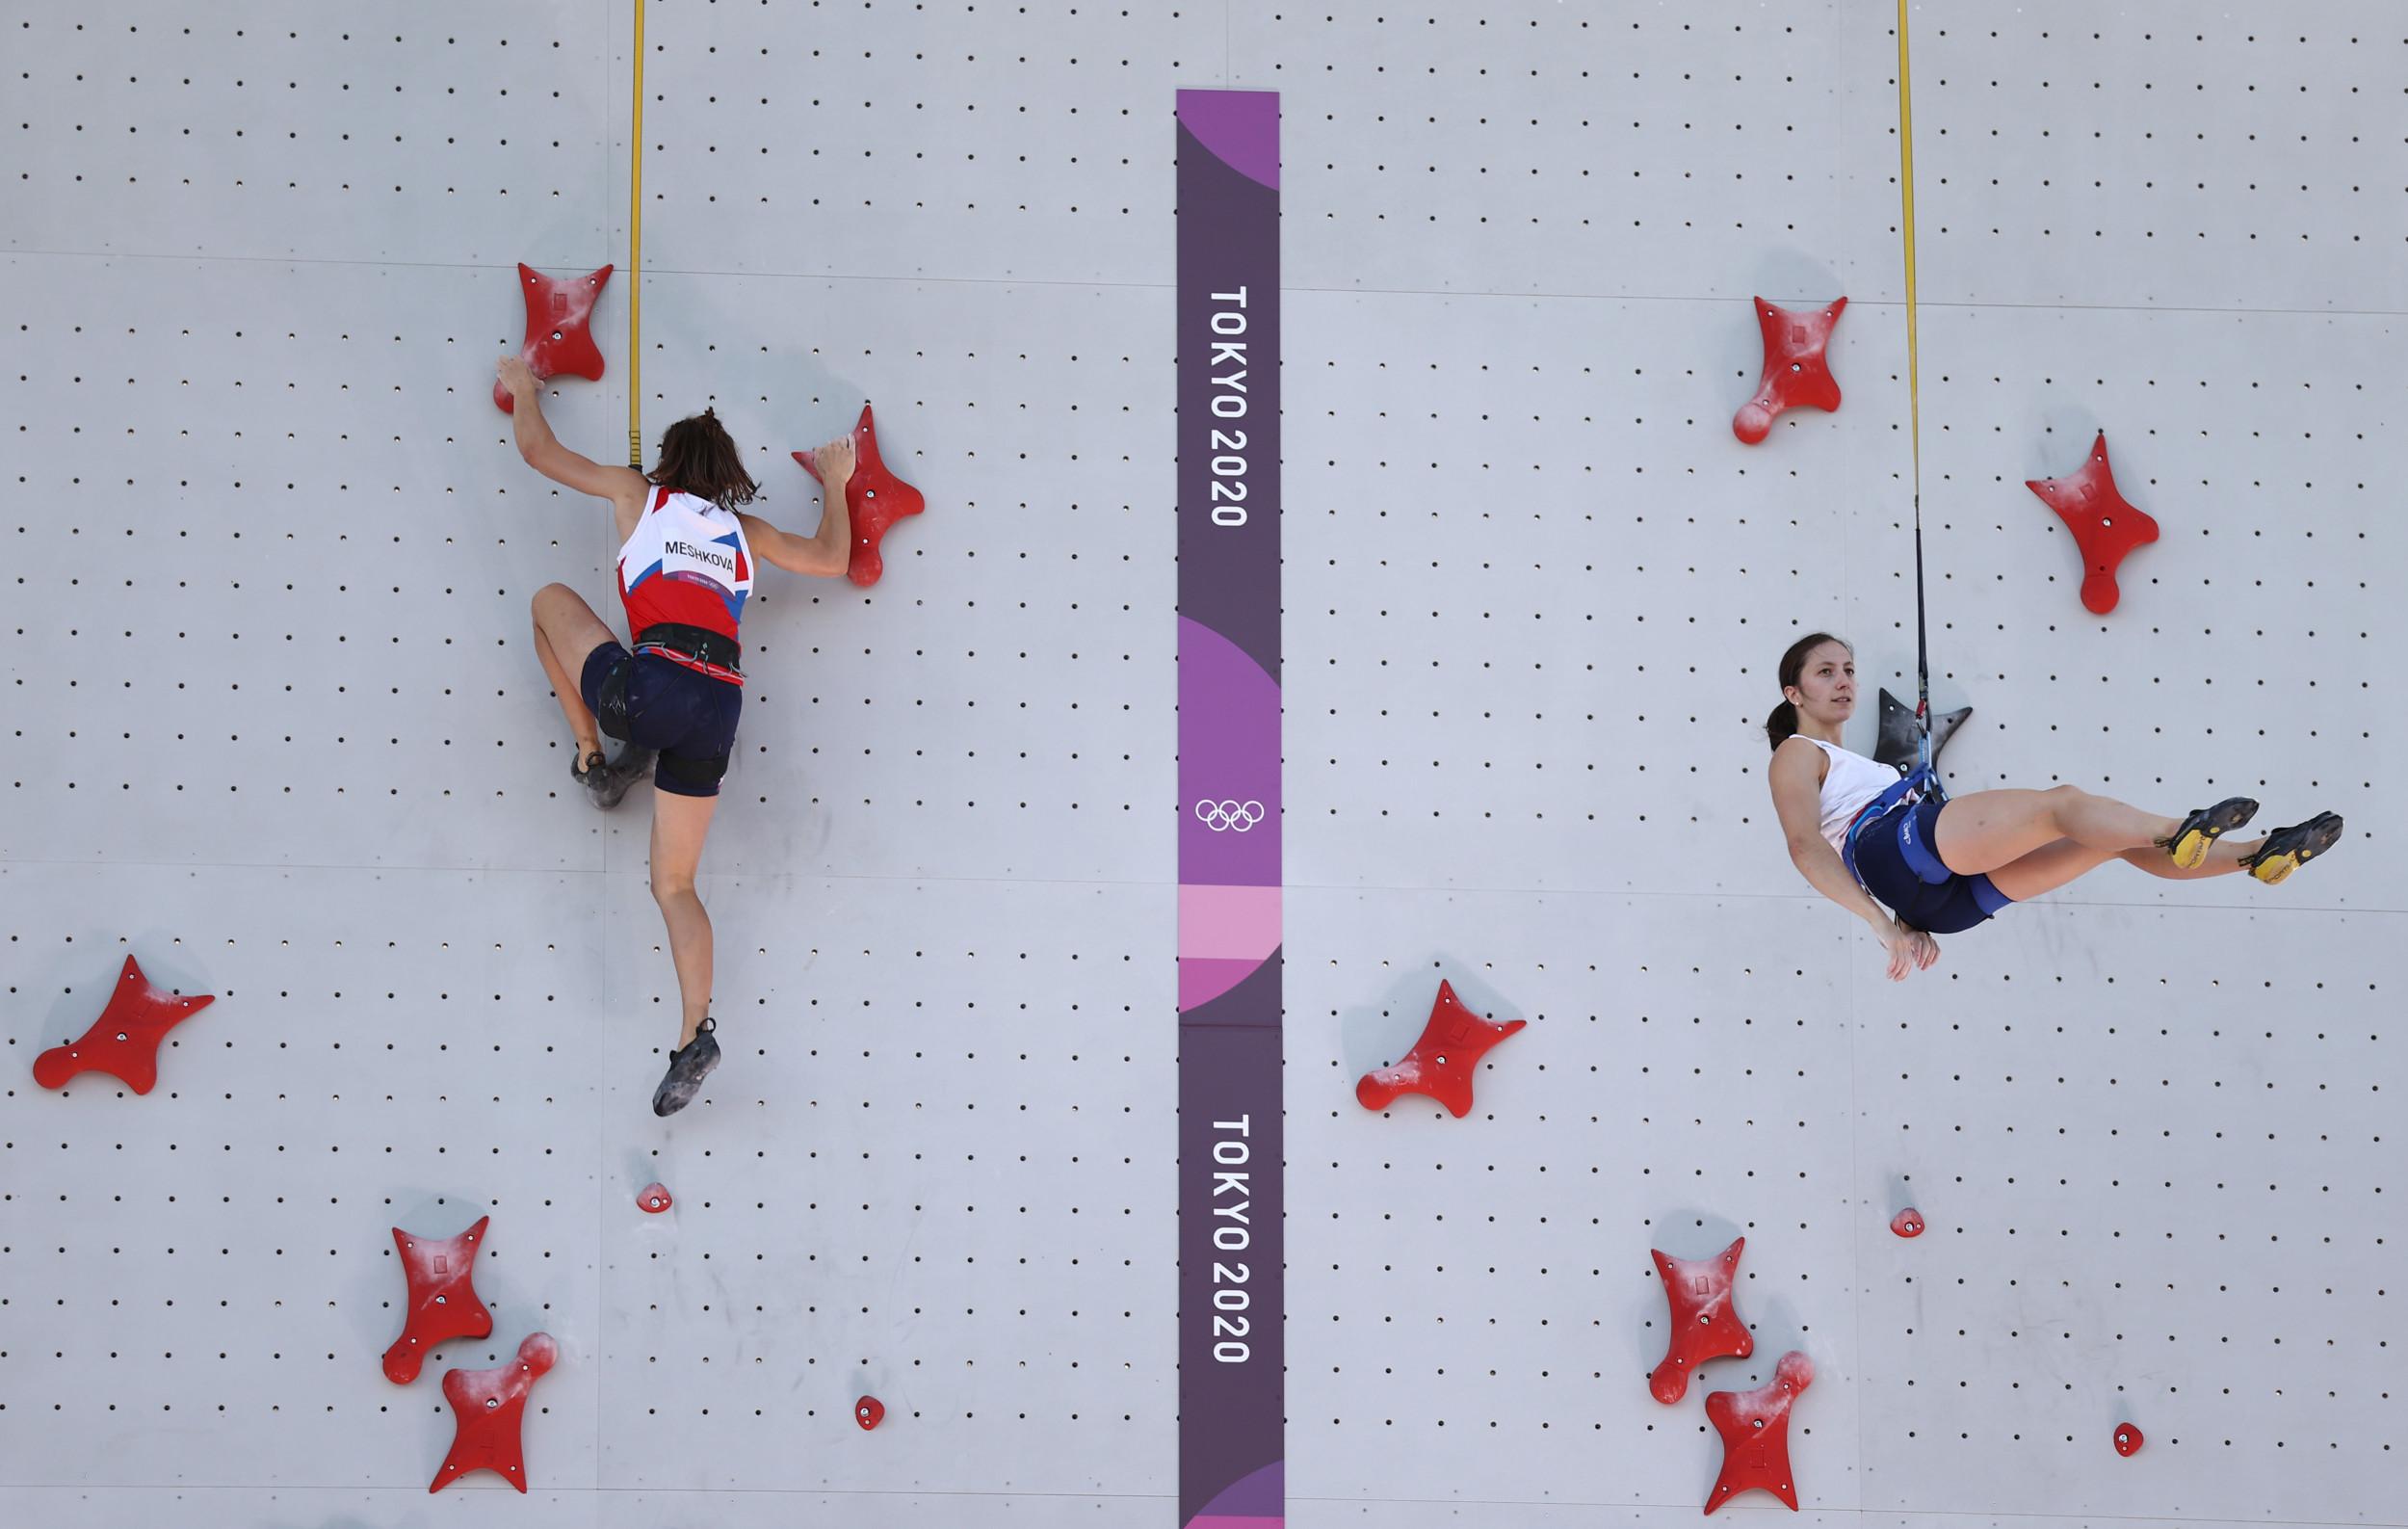 Tokyo 2020 Live Updates: Team USA Sets 400m Hurdles Record, Great Britain Gets Sailing Gold Despite Protest 1